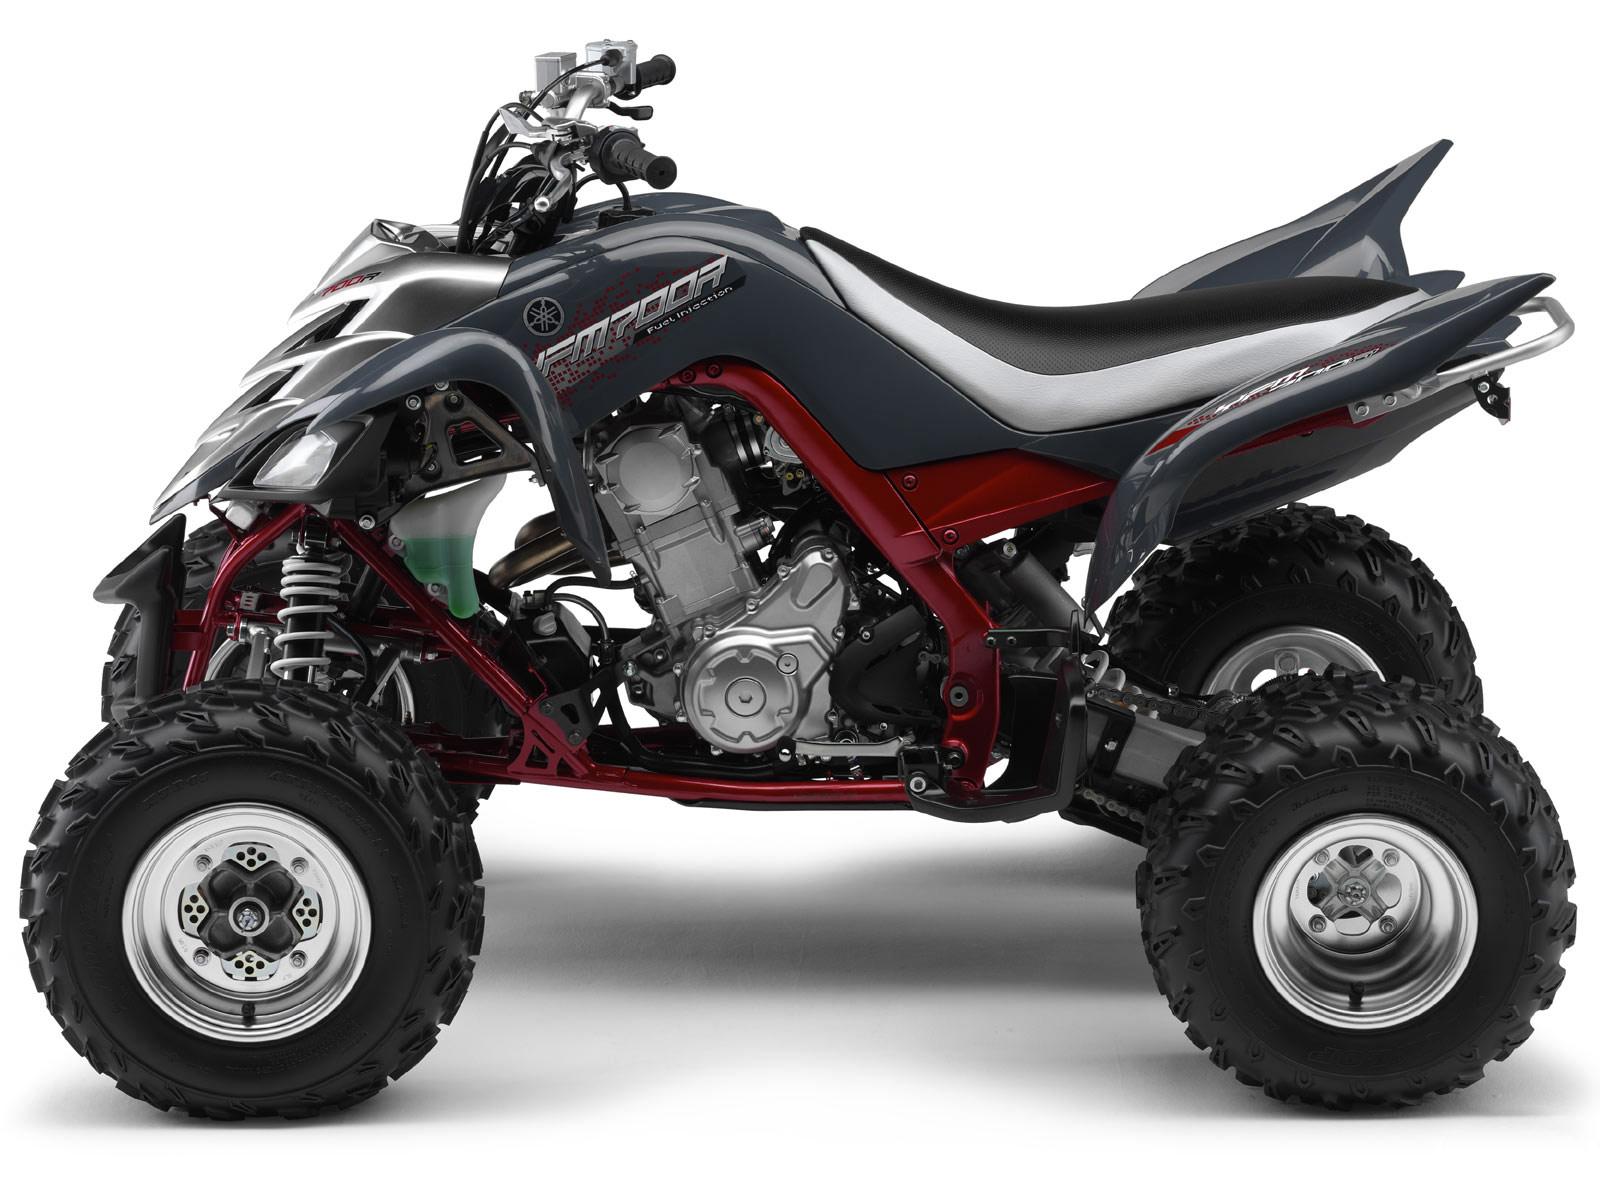 2007 YAMAHA Raptor 700R ATV accident lawyers wallpapers 1600x1200